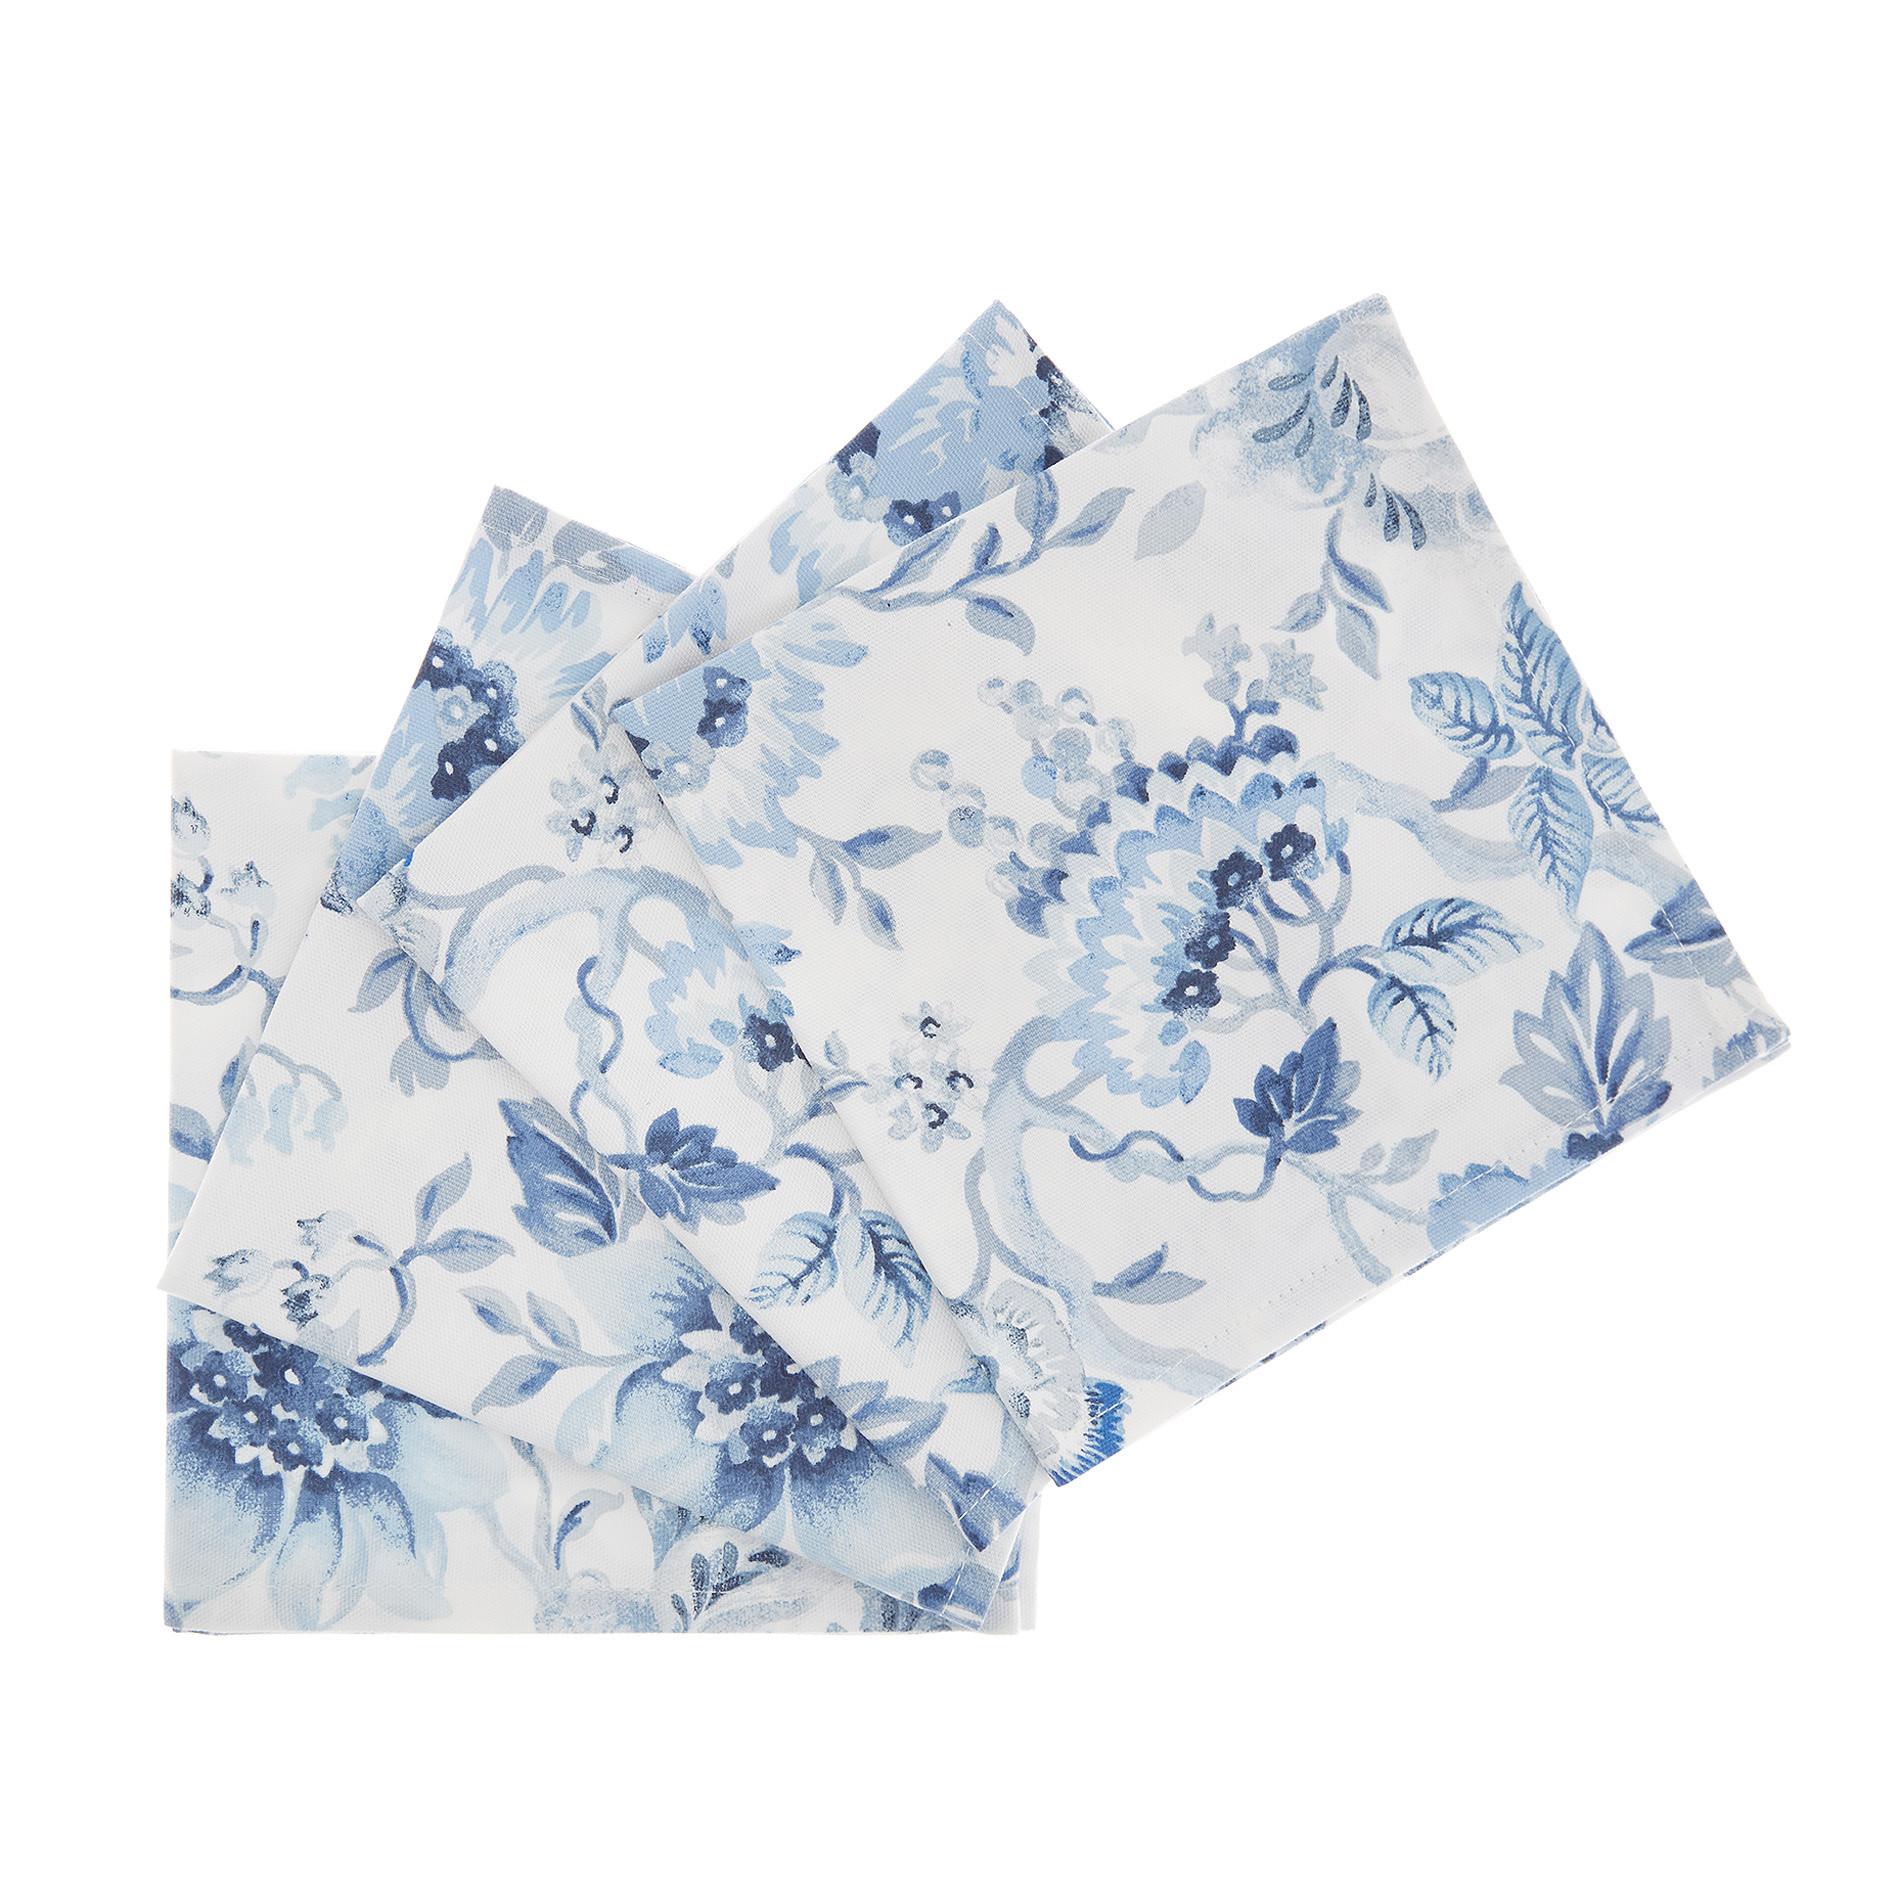 Set 4 tovaglioli puro cotone stampa floreale, Bianco, large image number 0